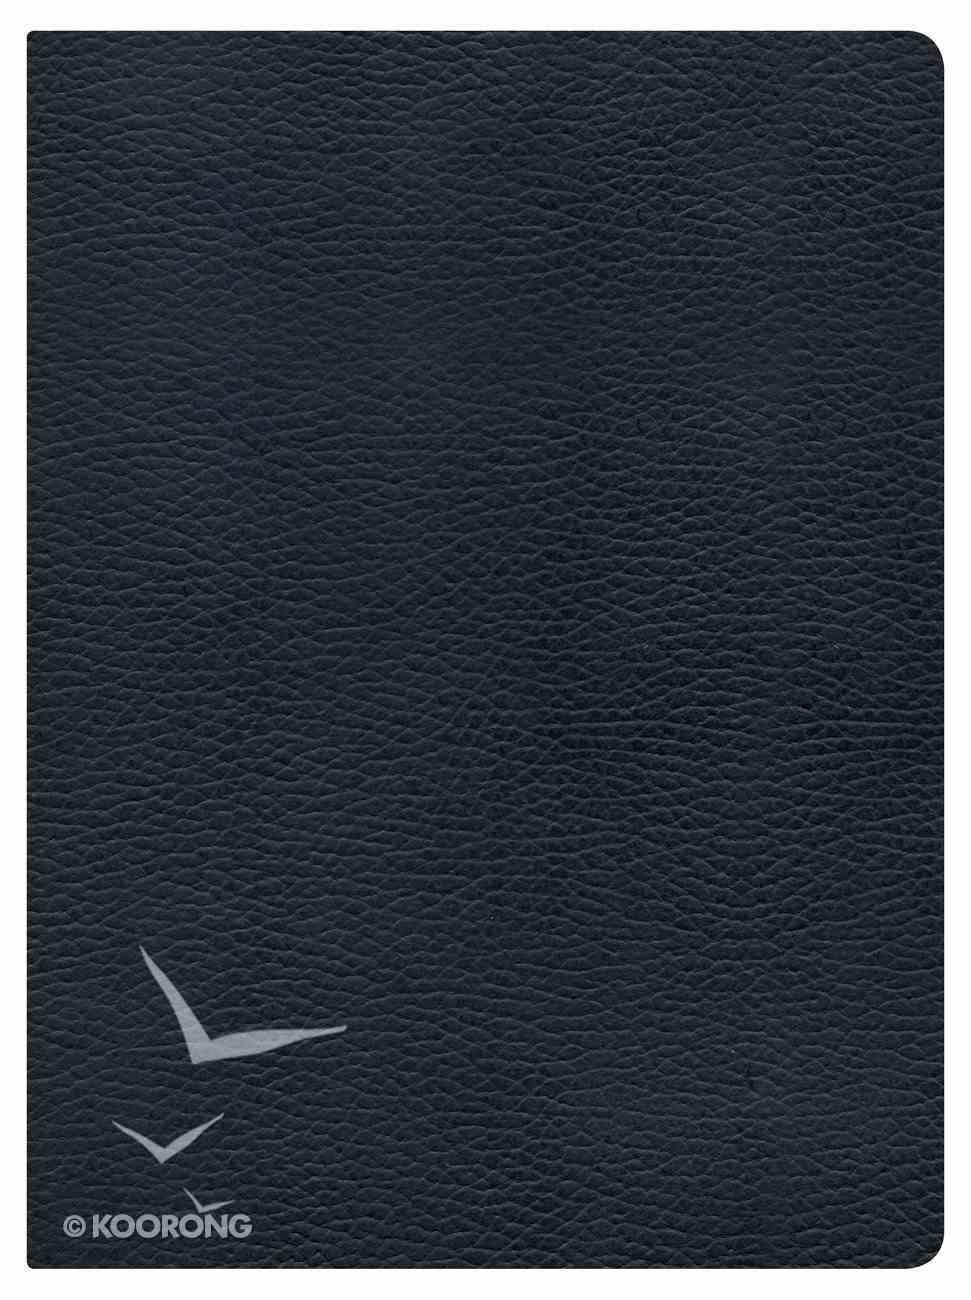 NKJV Holman Study Bible Black (Full-colour) Genuine Leather